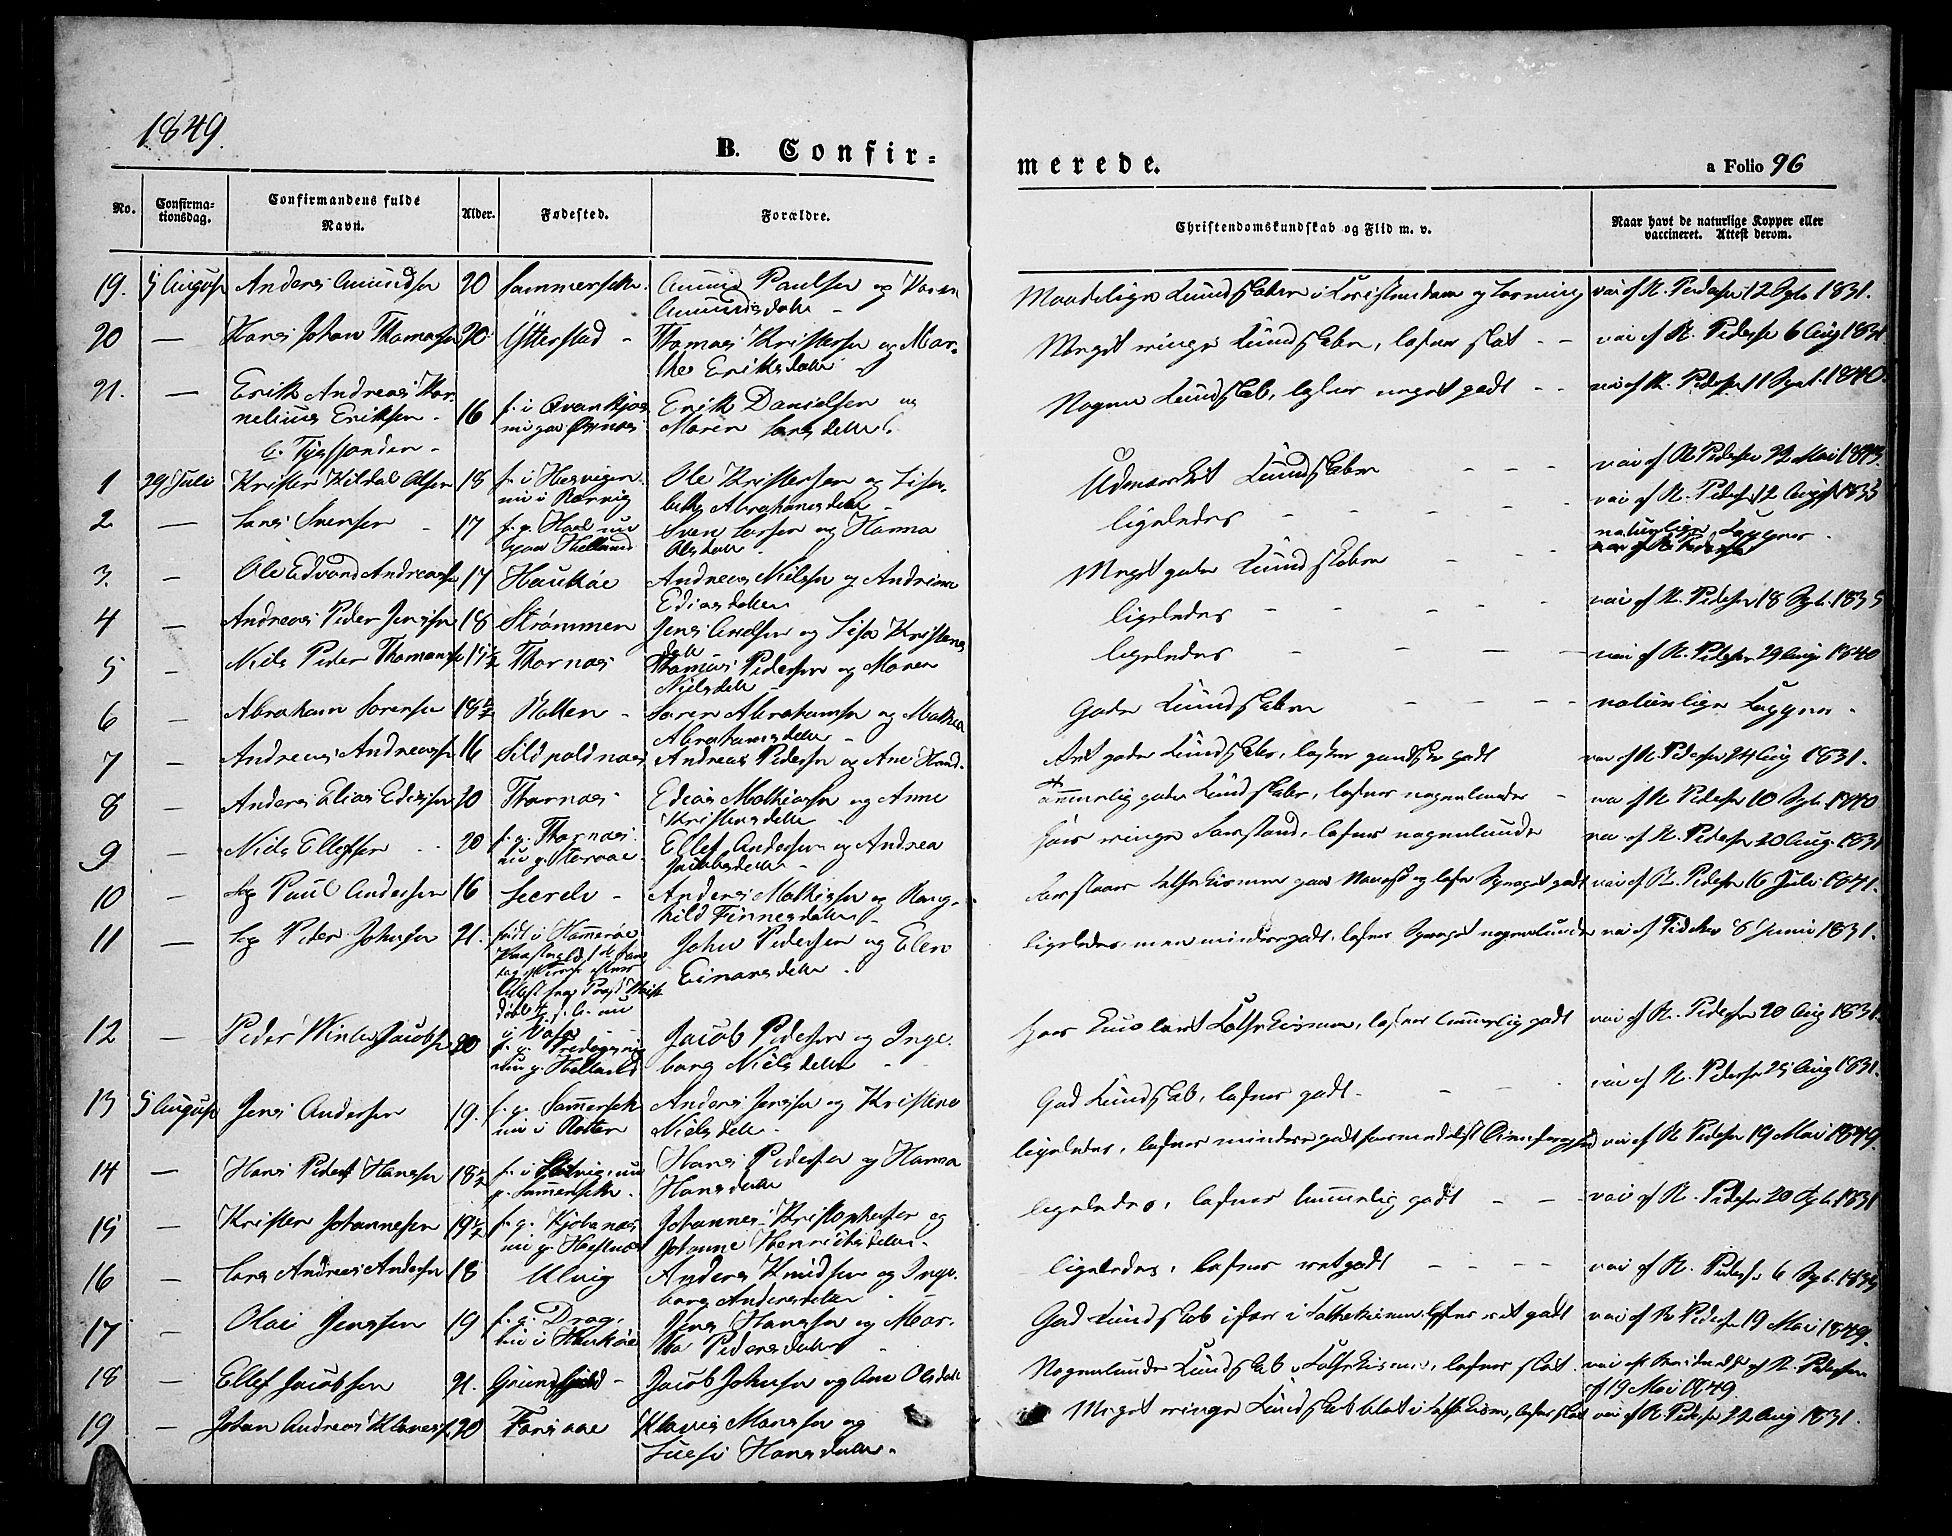 SAT, Ministerialprotokoller, klokkerbøker og fødselsregistre - Nordland, 872/L1045: Klokkerbok nr. 872C01, 1840-1851, s. 96